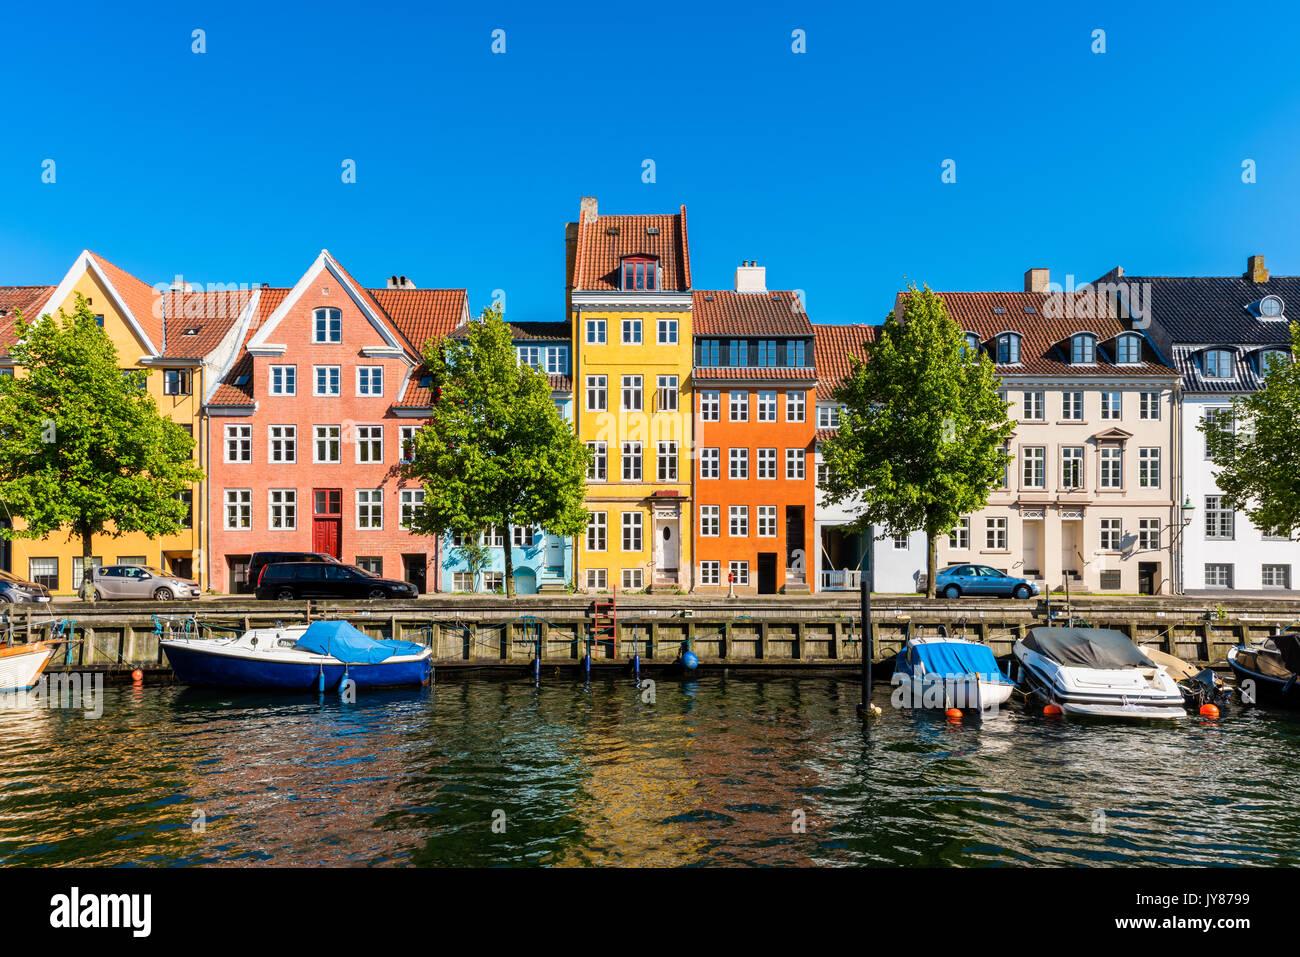 Bunte Häuser am Kanal in Kopenhagen Dänemark Stockbild